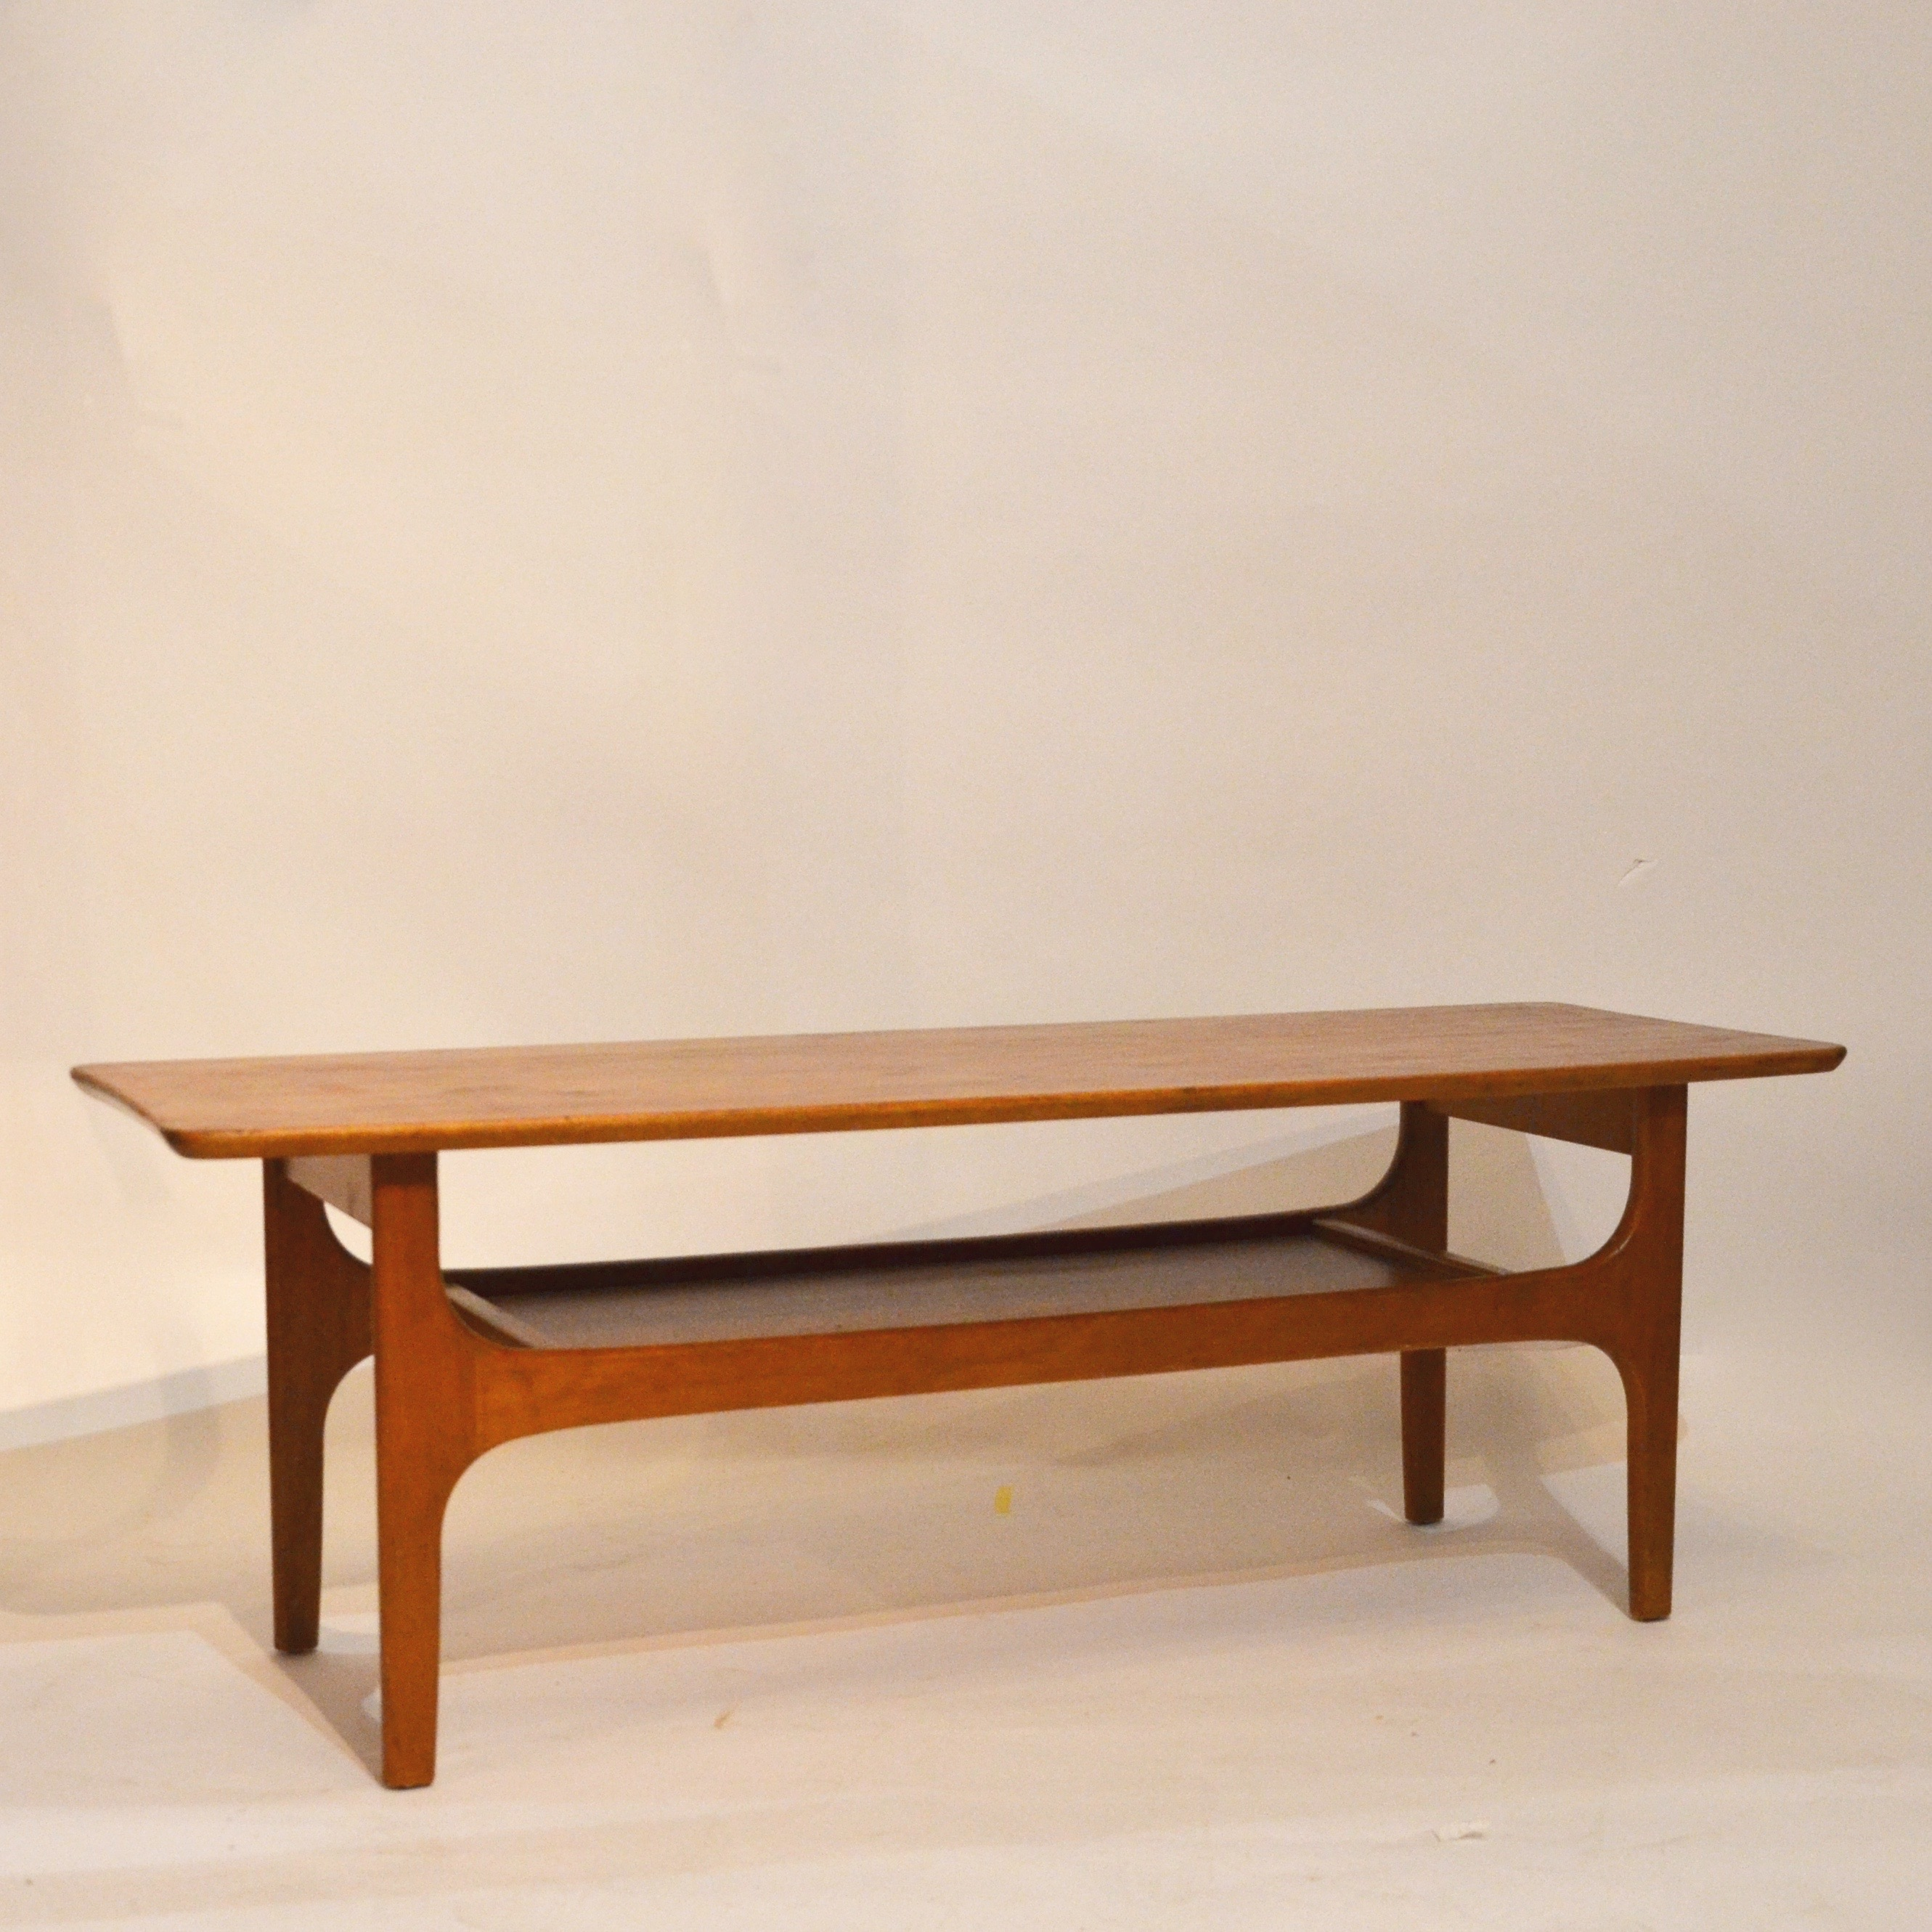 table basse de style scandinave bindiesbindies. Black Bedroom Furniture Sets. Home Design Ideas